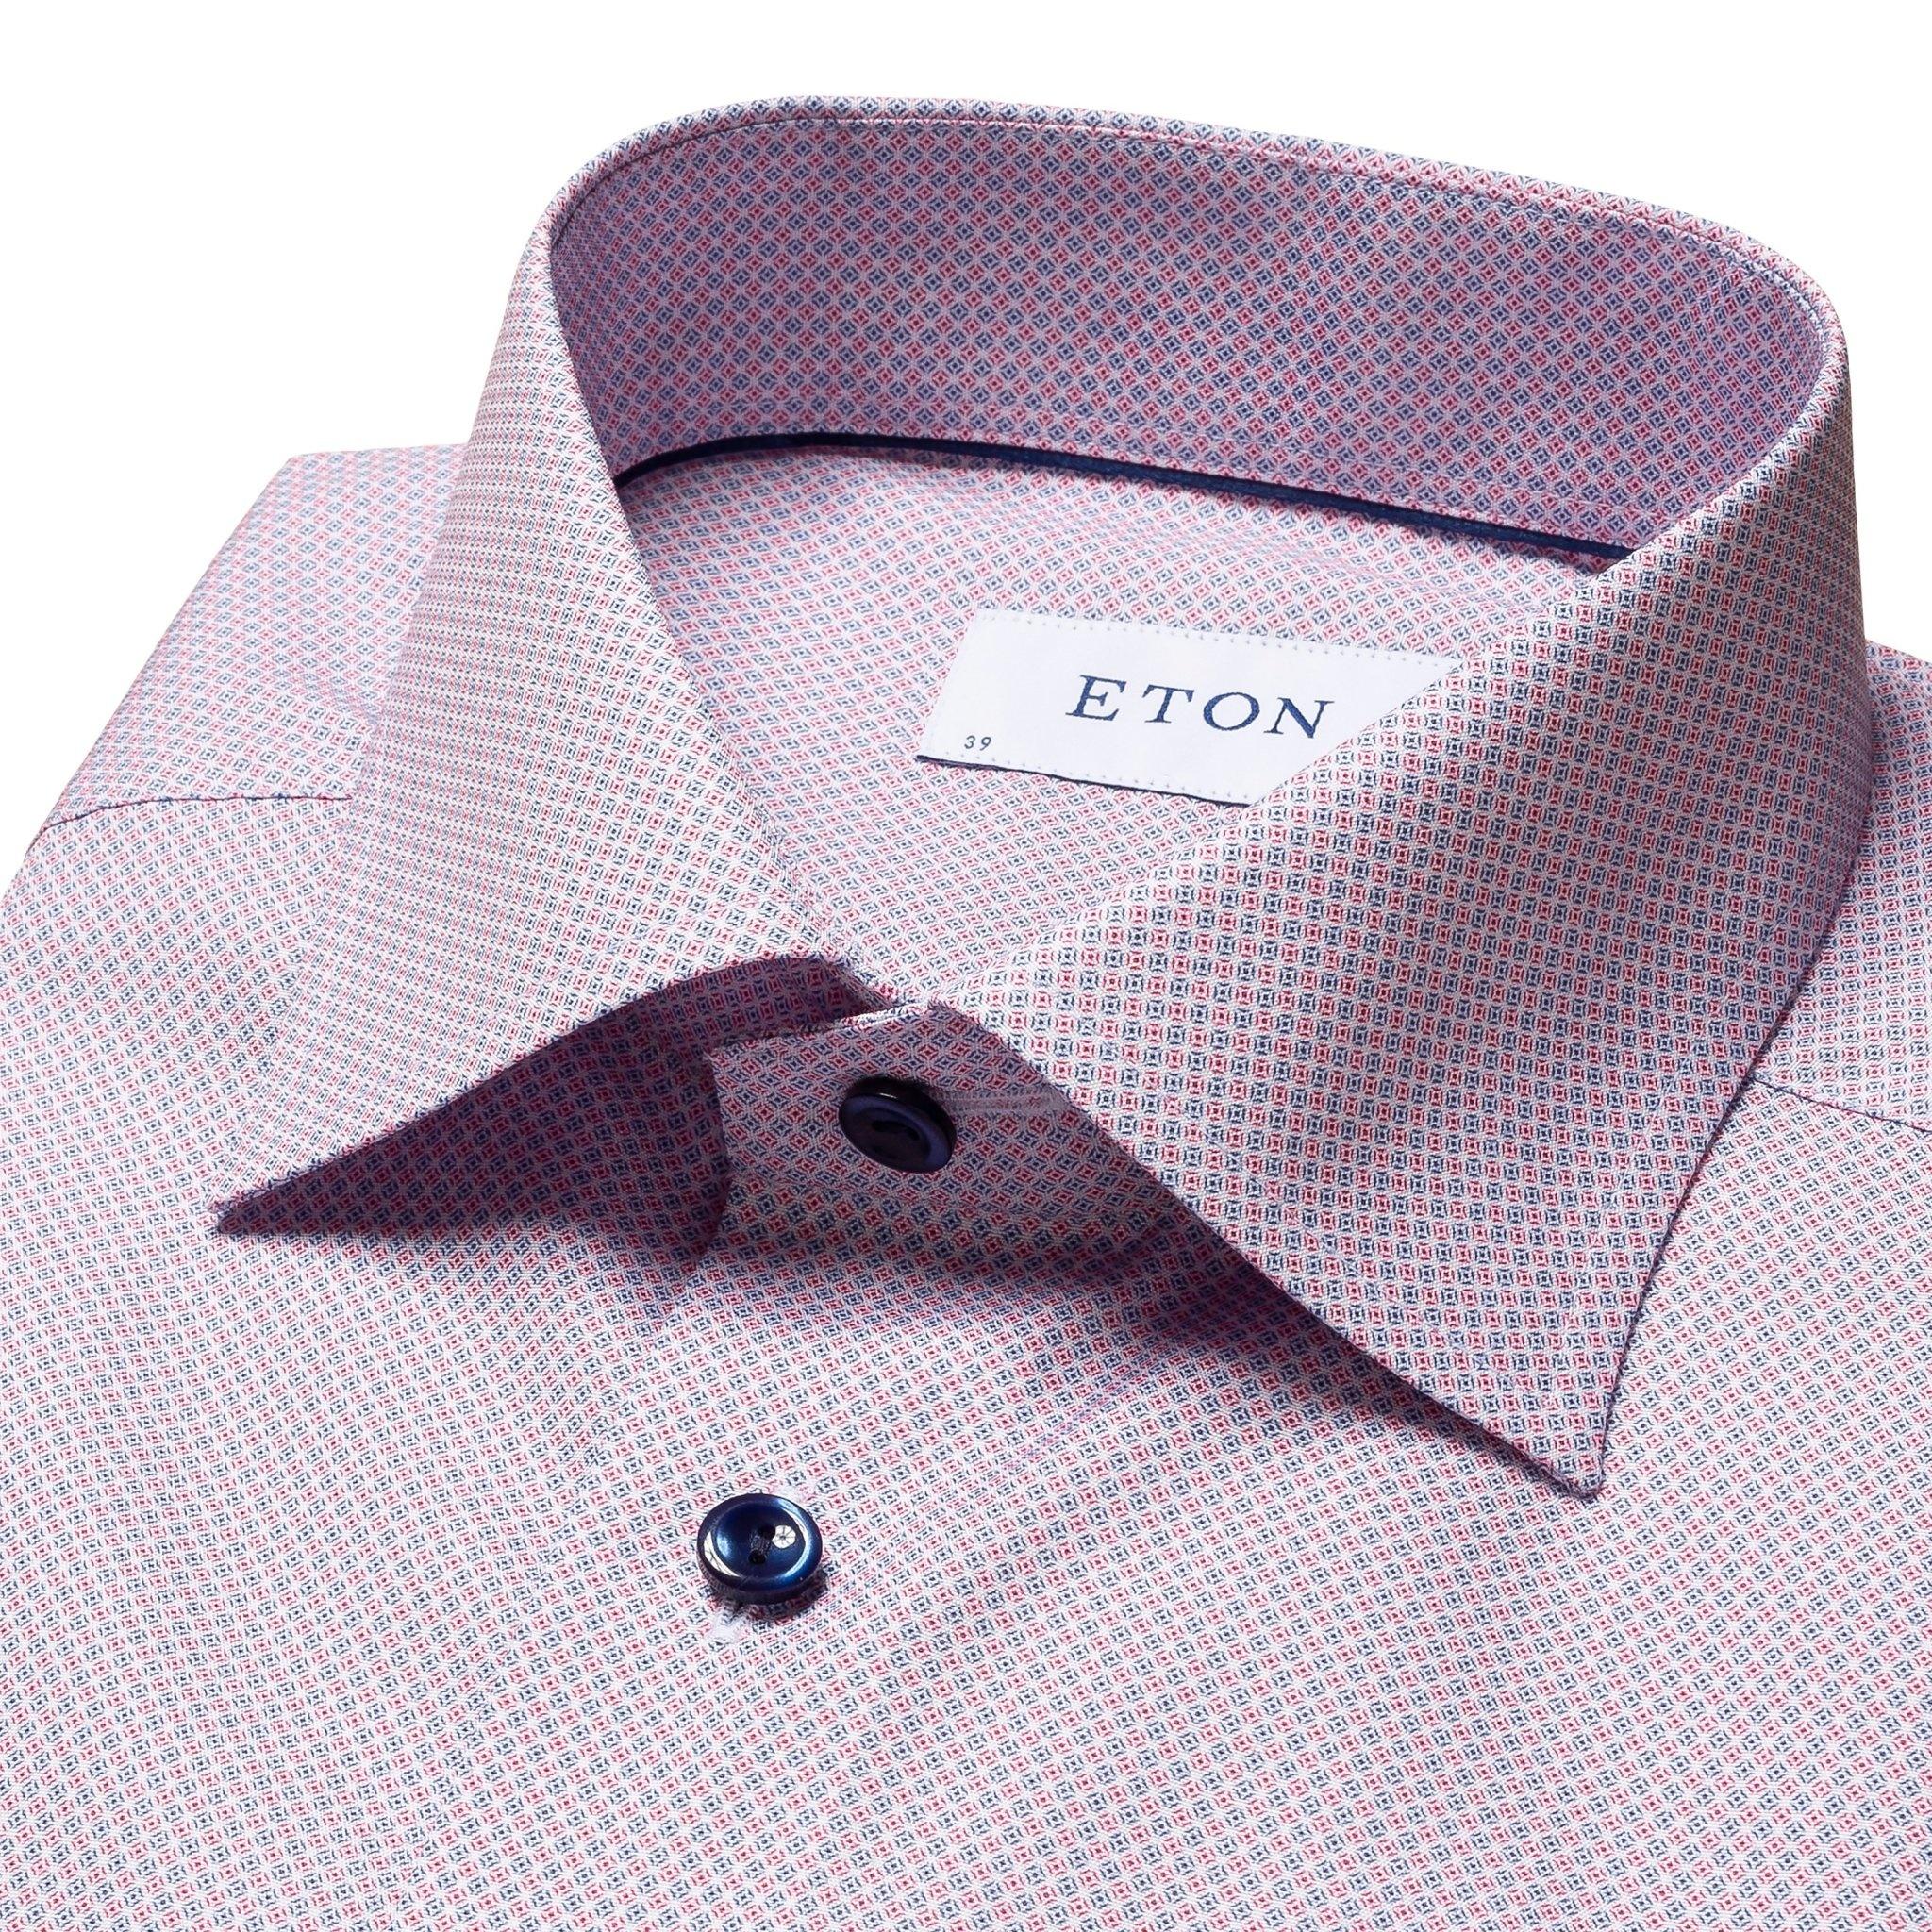 Eton Pink/Navy Print with navy button